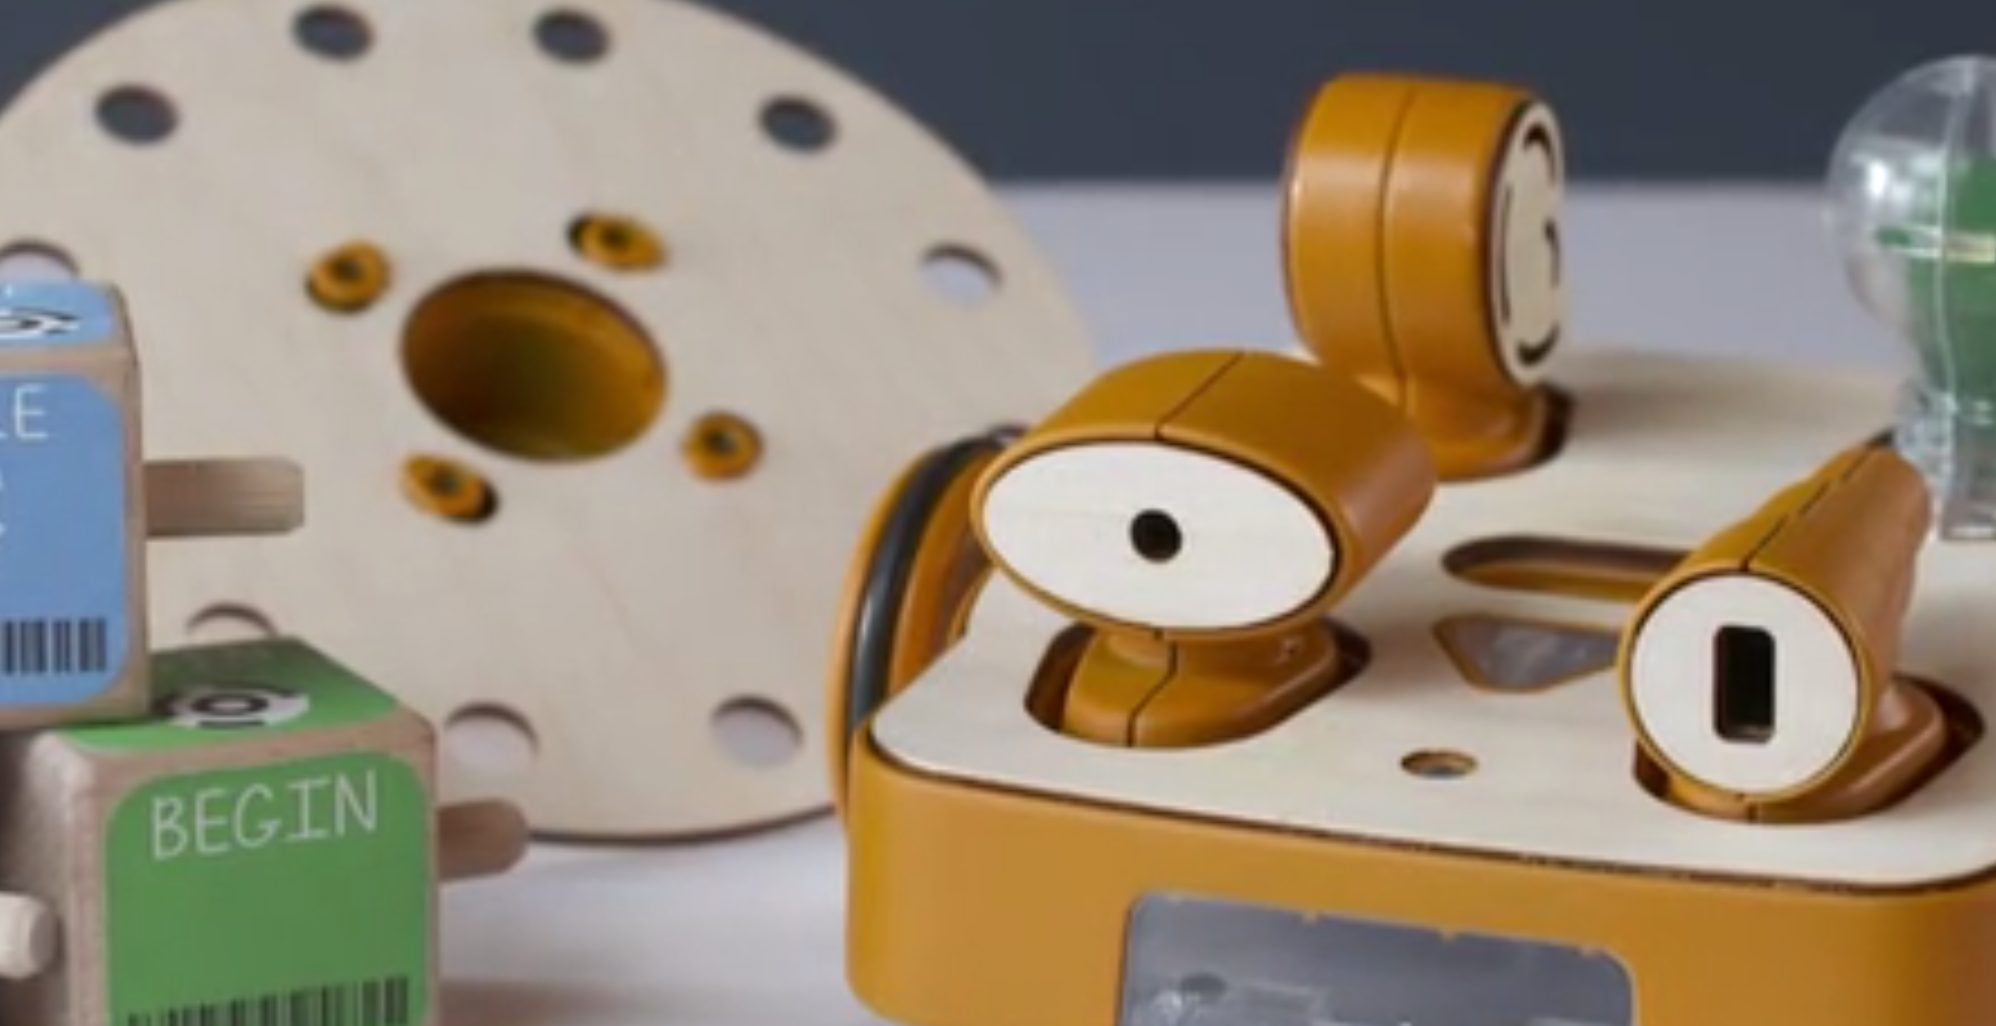 KIBO Kit: Image courtesy of KinderLab Robotics, Inc 2014